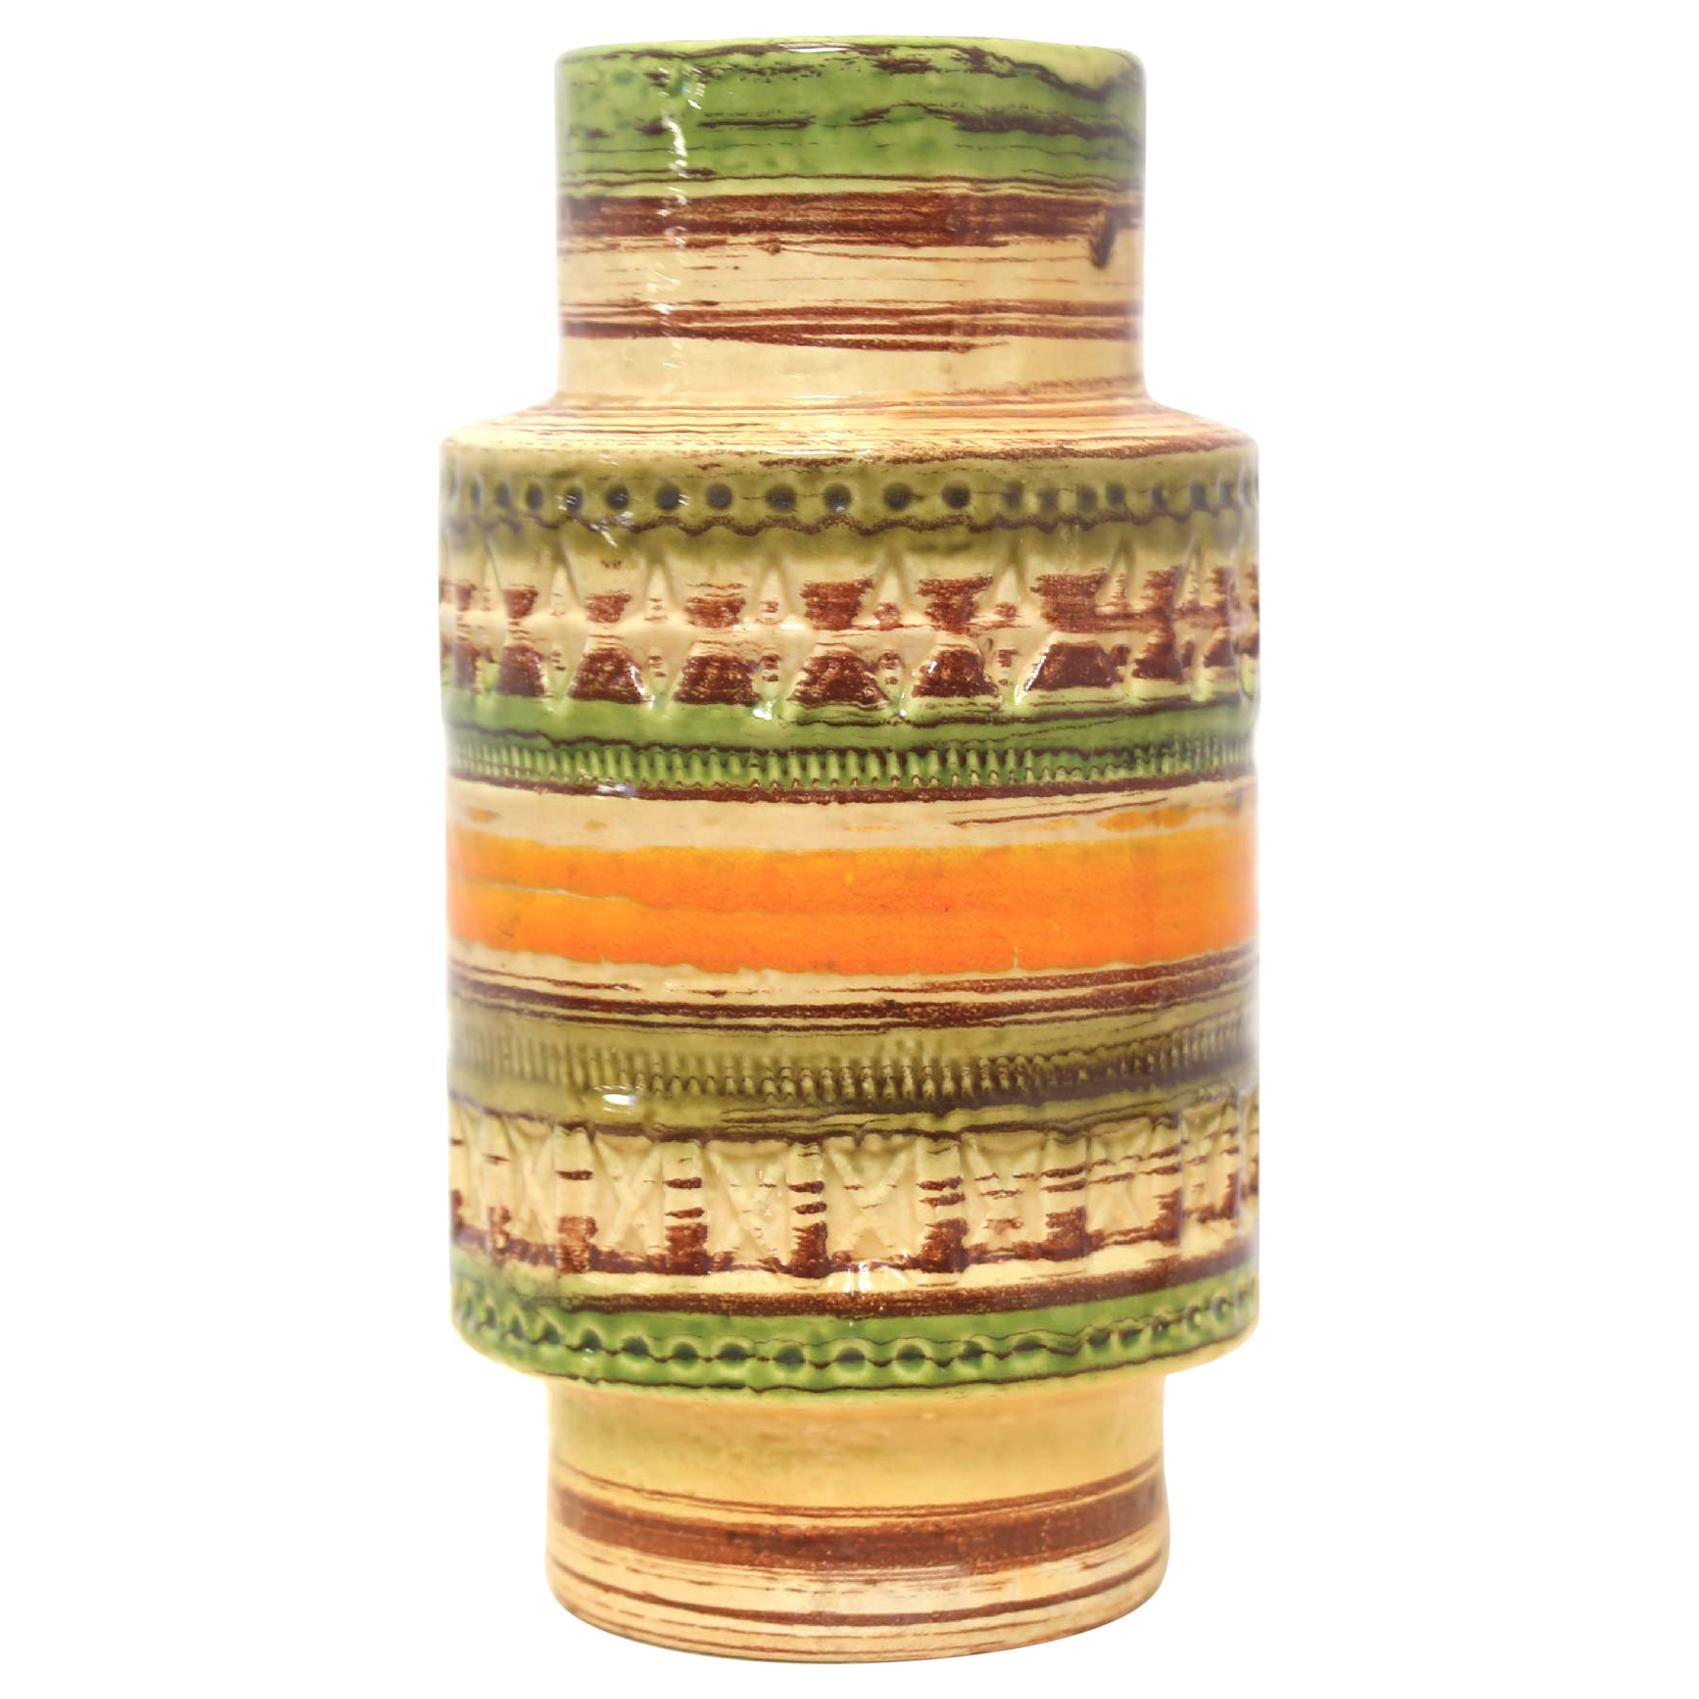 Mid Century Italian Yellow Green Orange Ceramic Vase by Bitossi, 1950s